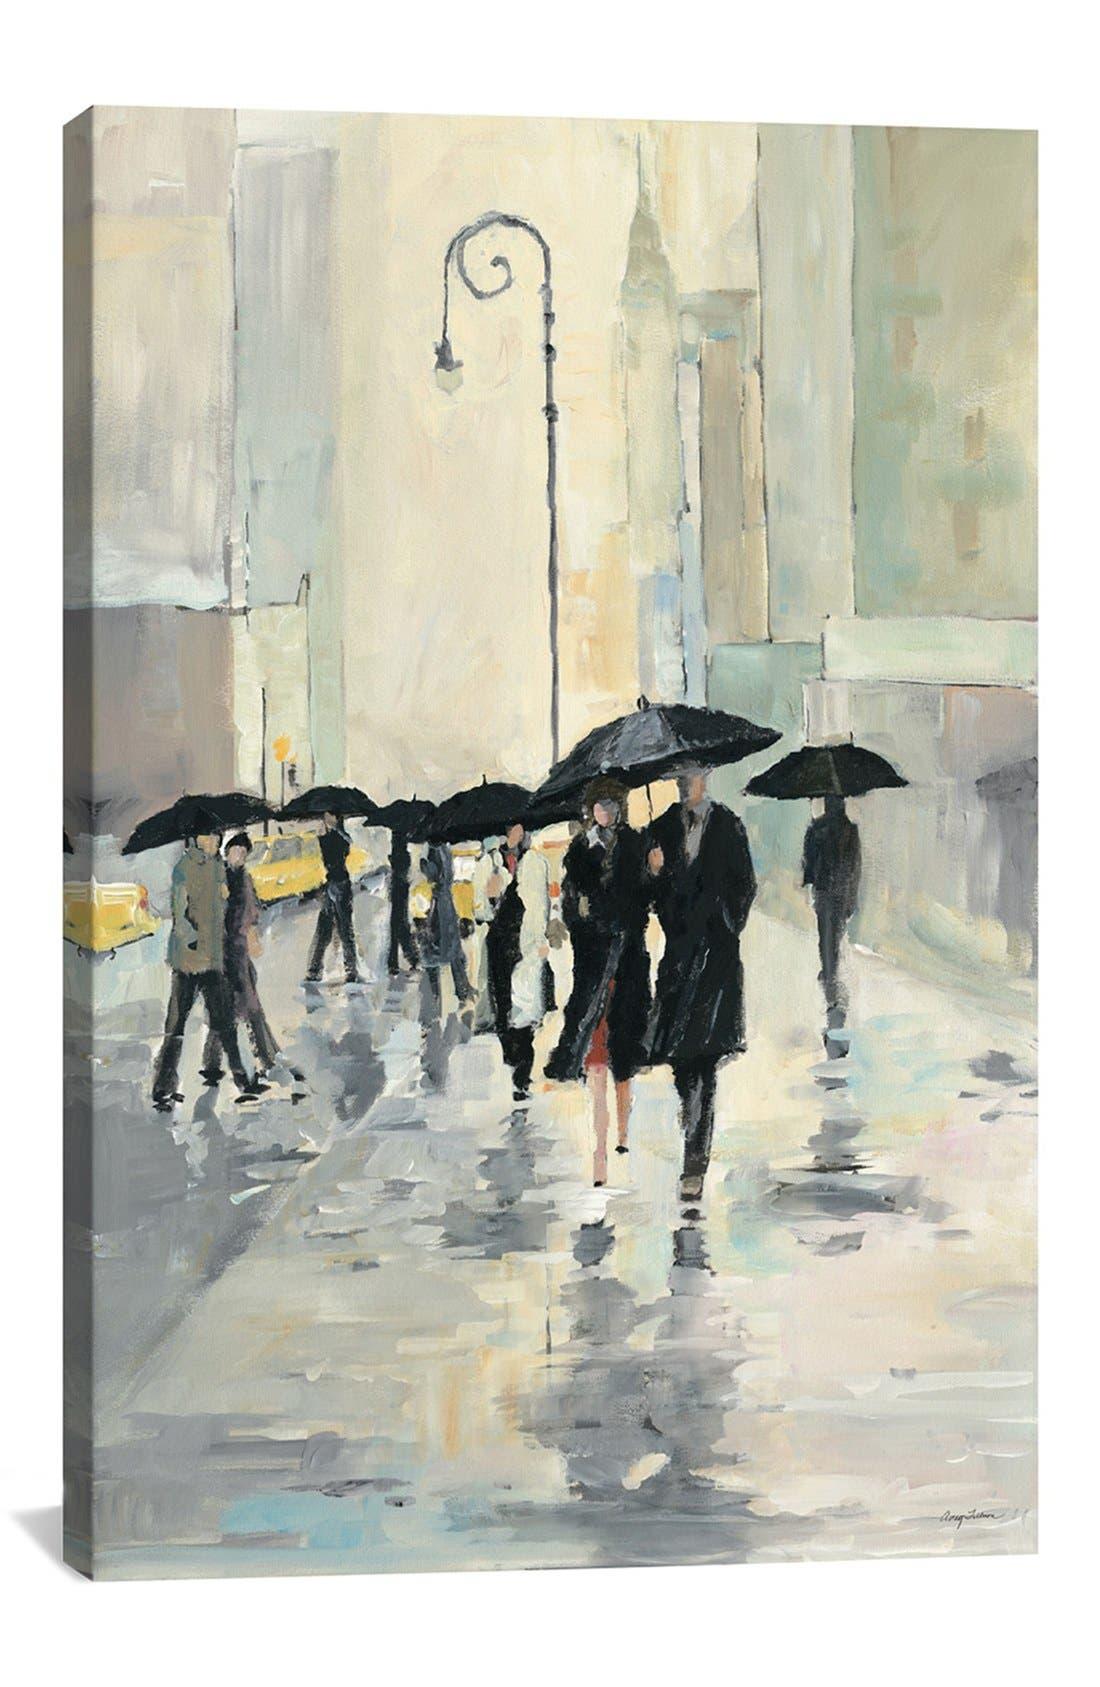 Alternate Image 1 Selected - iCanvas 'City in the Rain - Avery Tillmon' Giclée Print Canvas Art